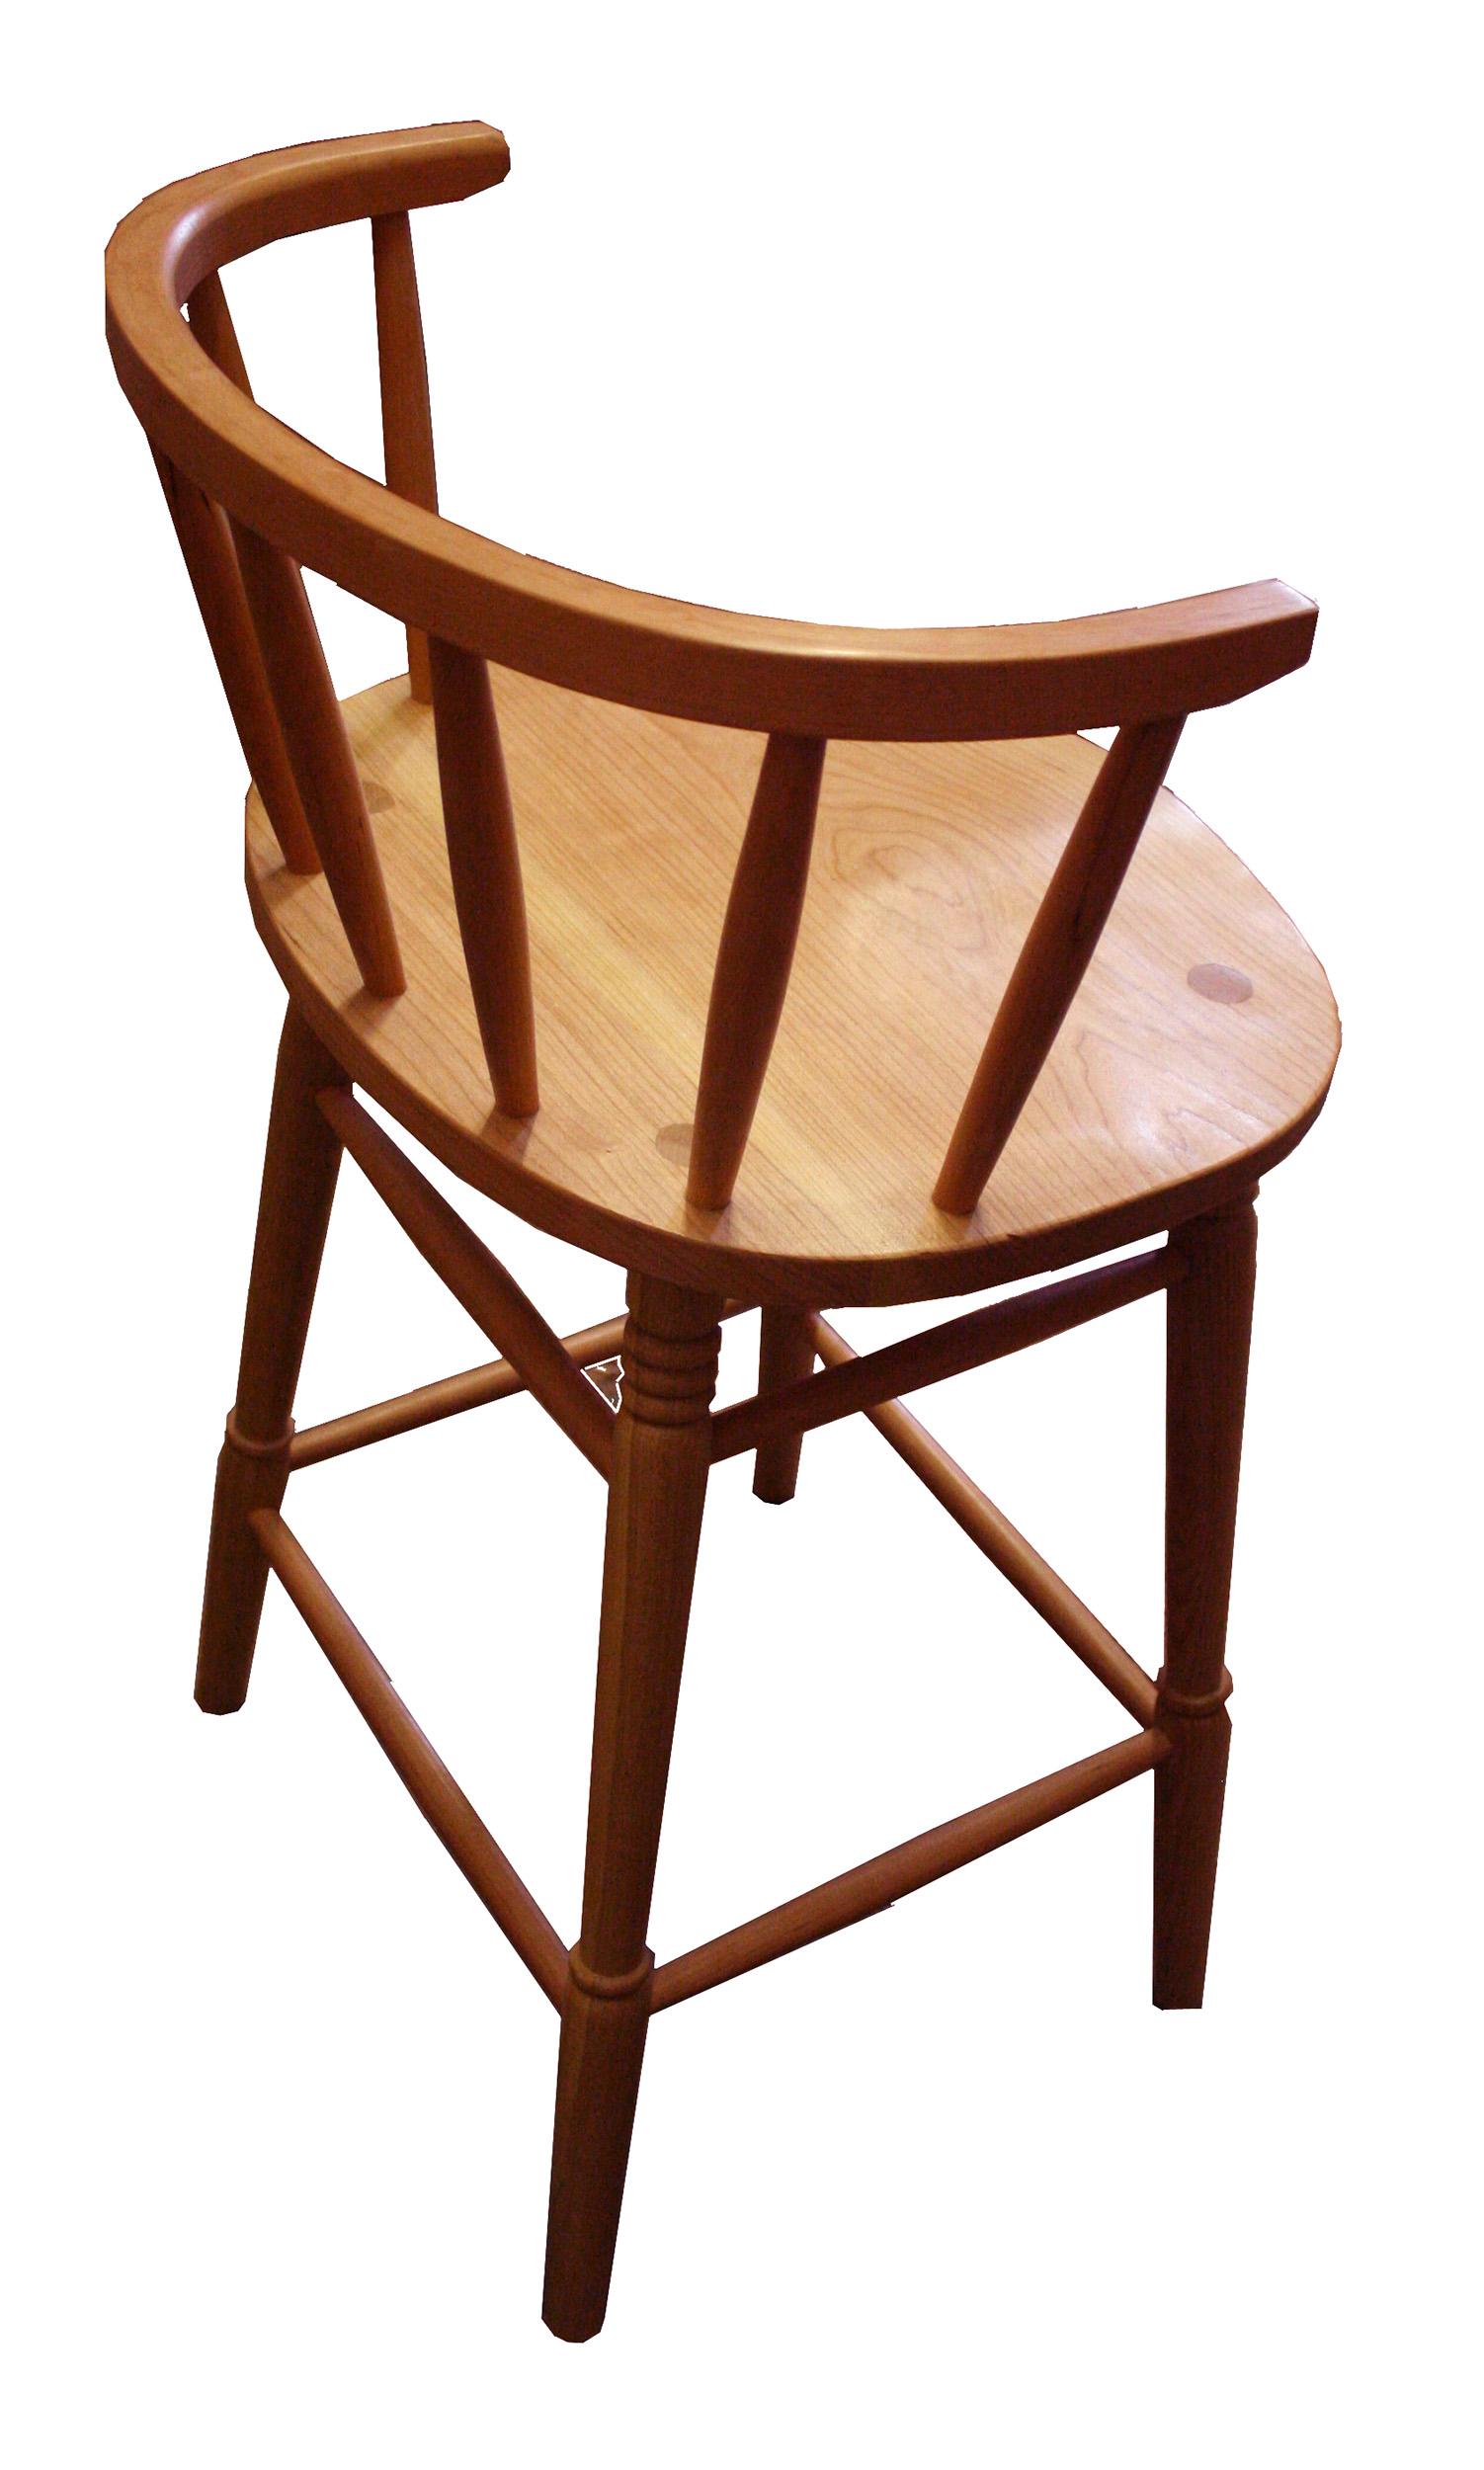 Bar stool in cherry